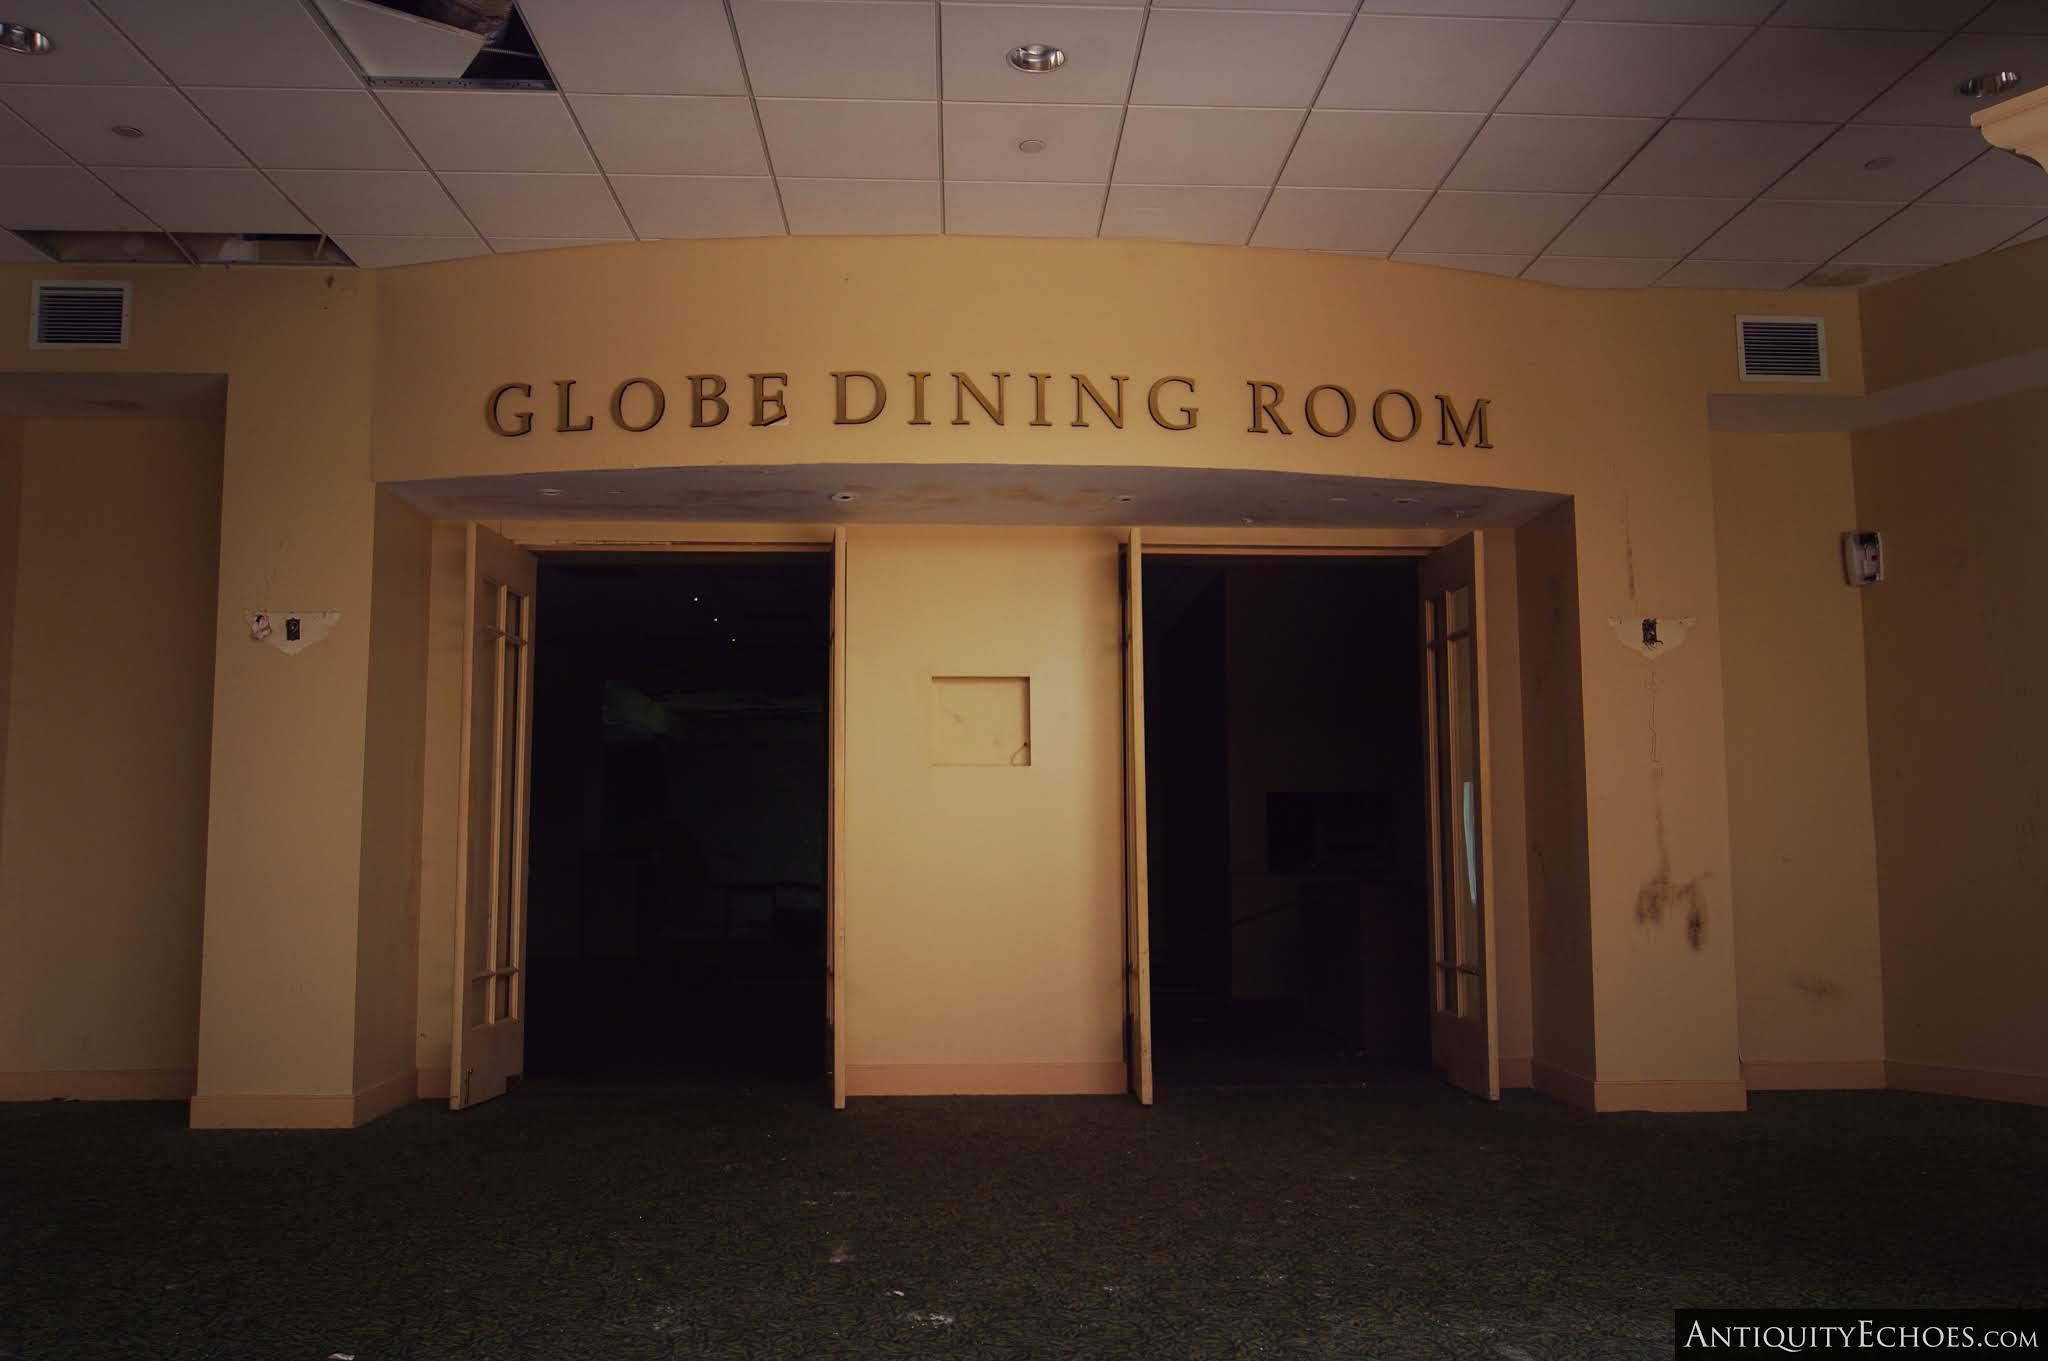 Nevele Grande - Entrance to the Globe Dining Room